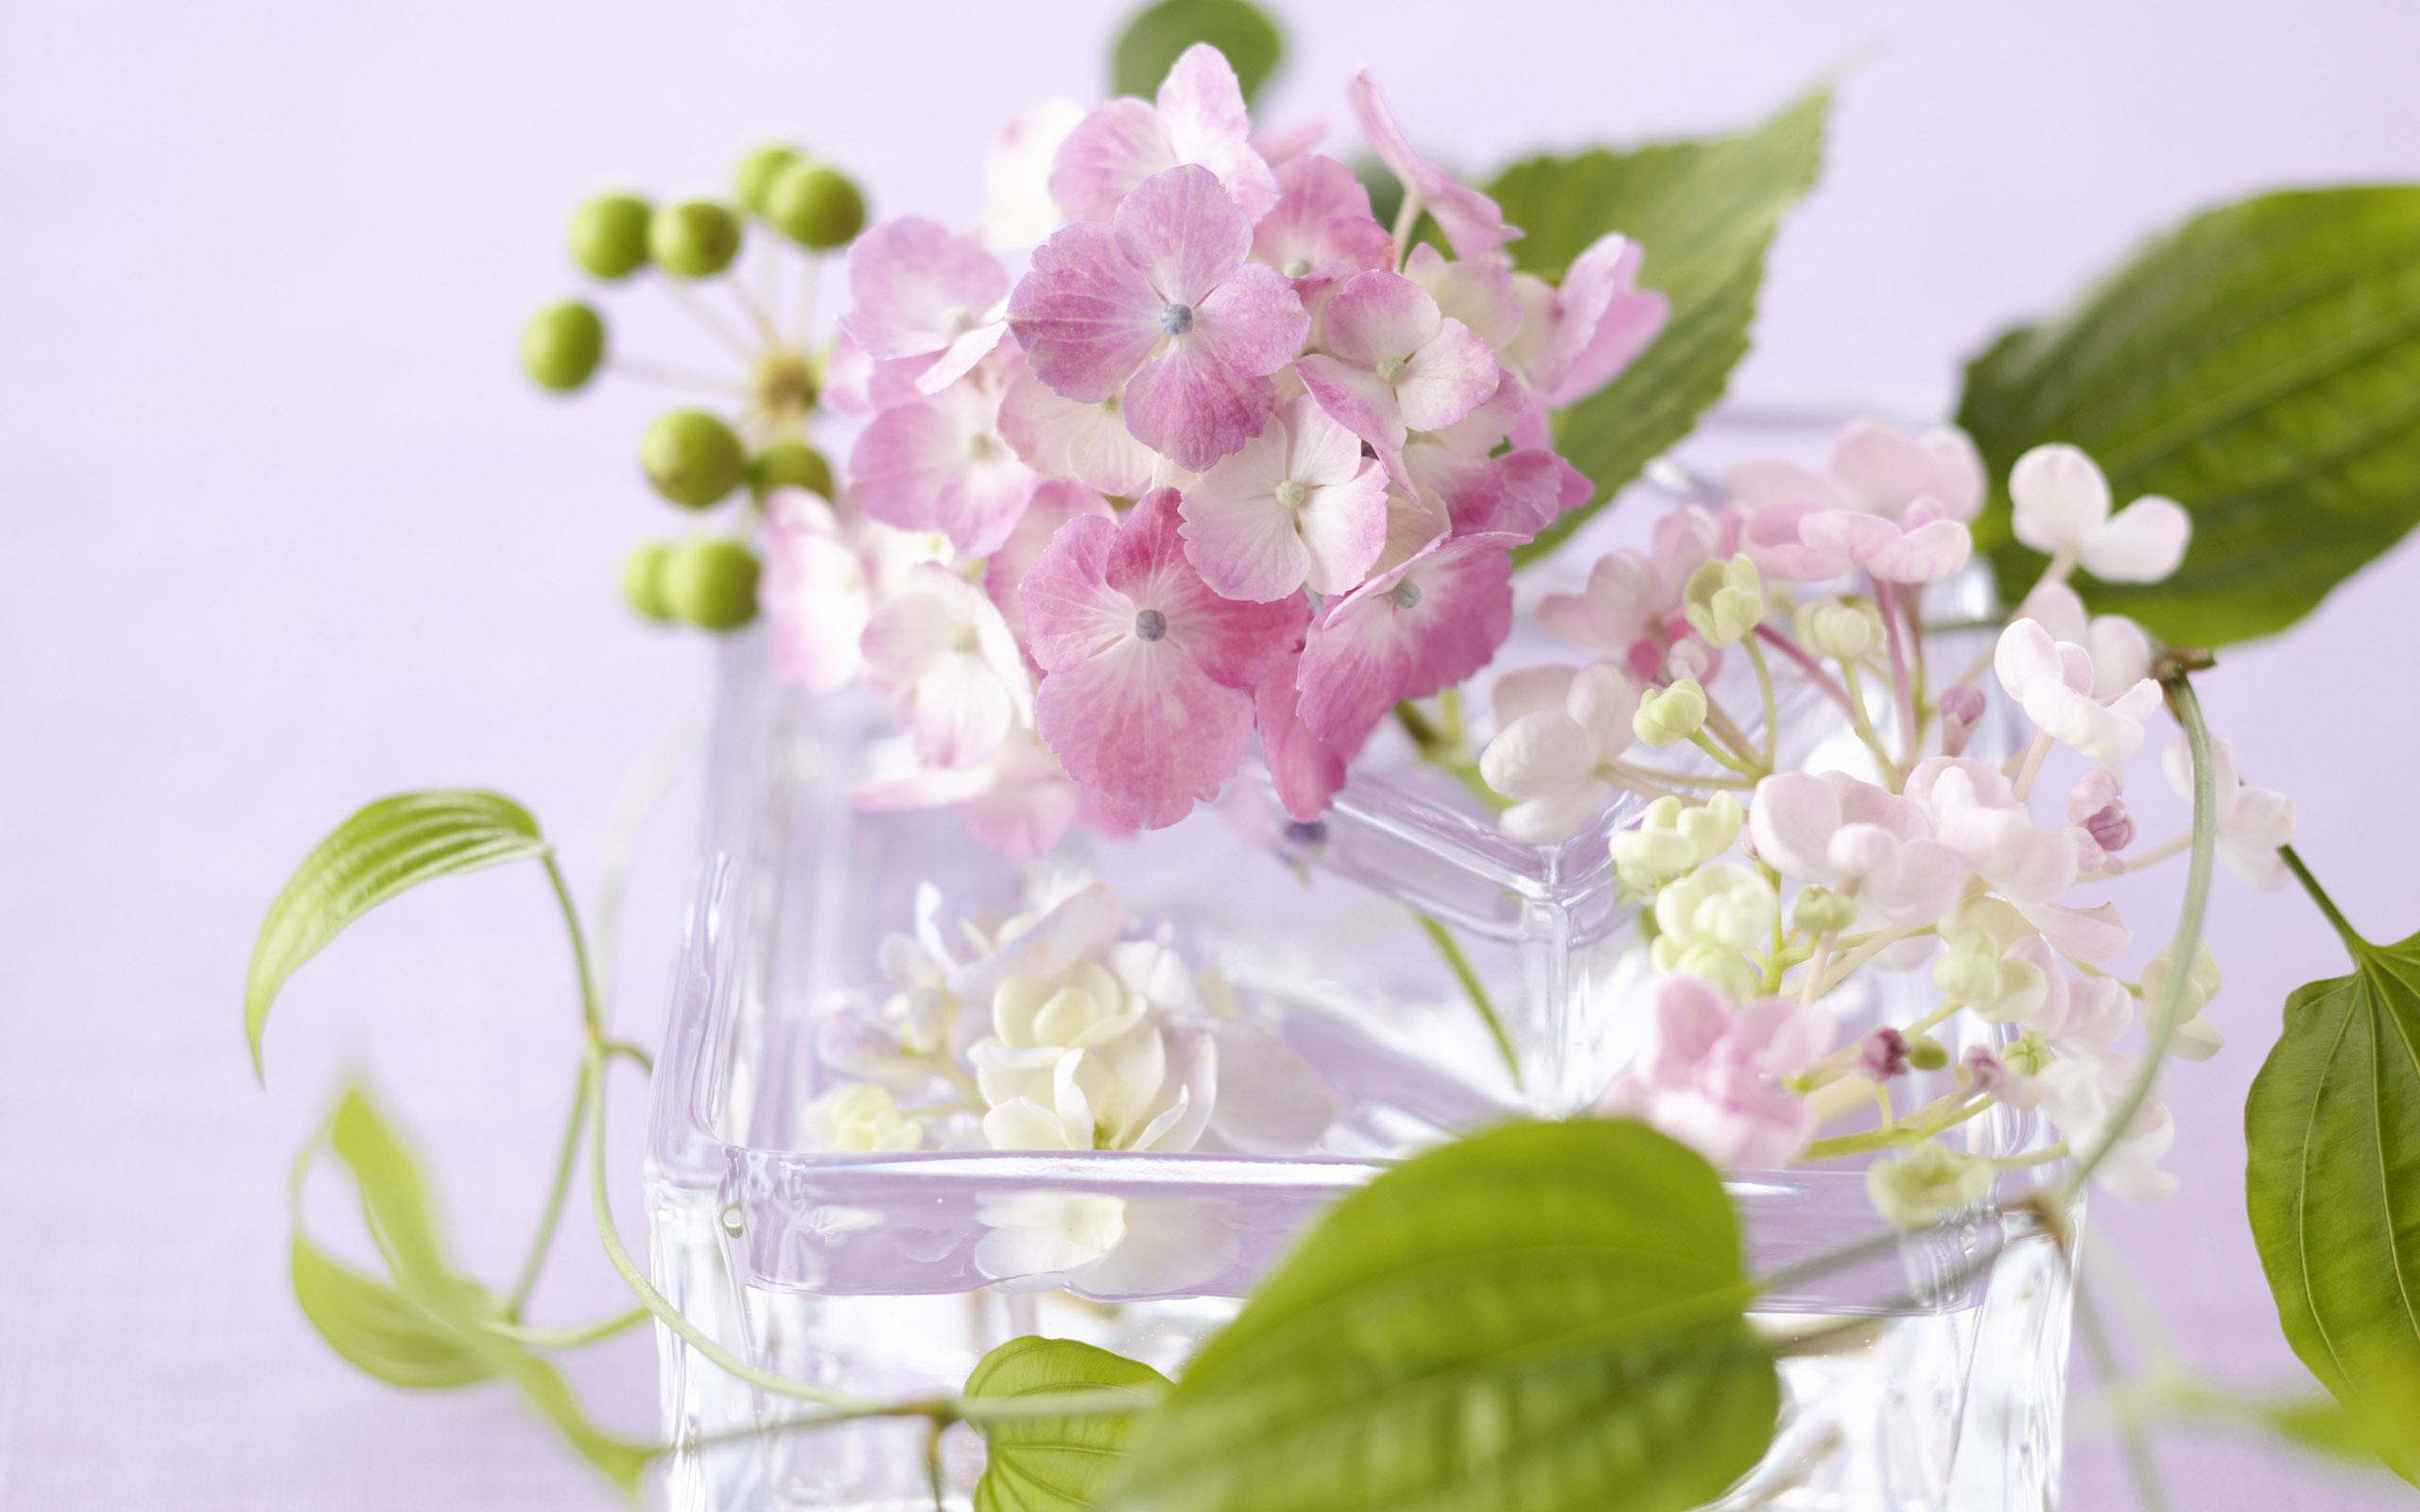 Anyák napja – A(z online) virágárusok ünnepe